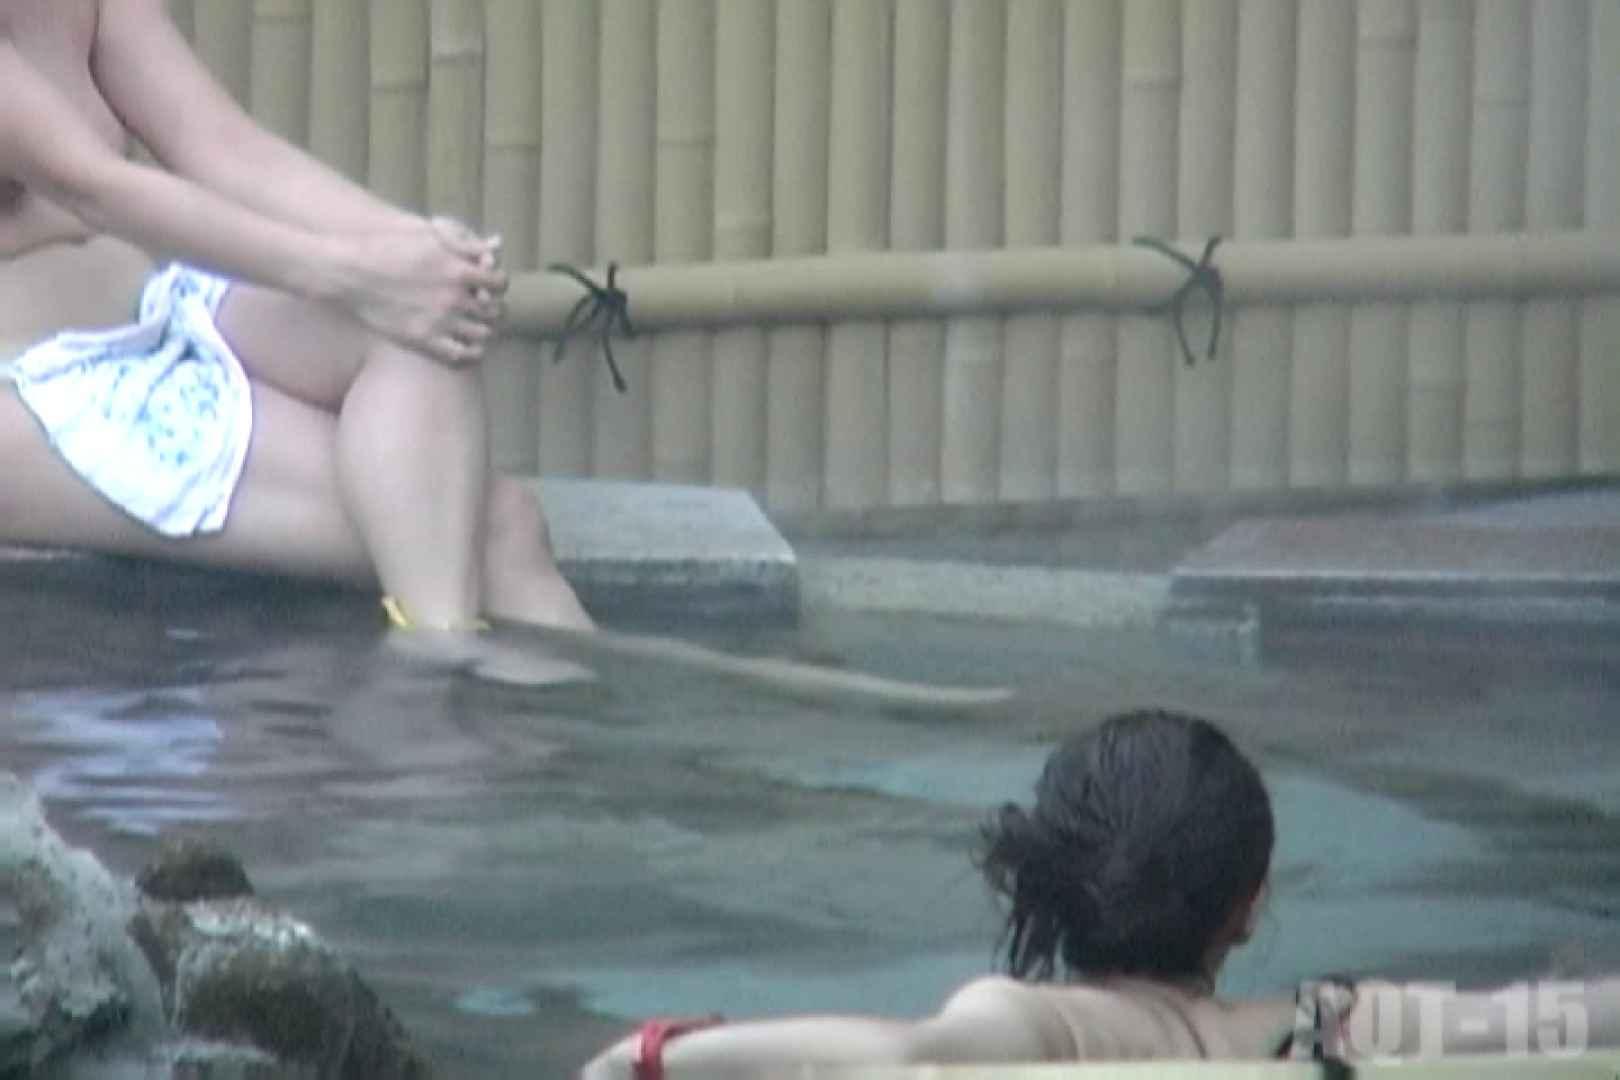 Aquaな露天風呂Vol.837 美しいOLの裸体 おめこ無修正画像 100pic 5